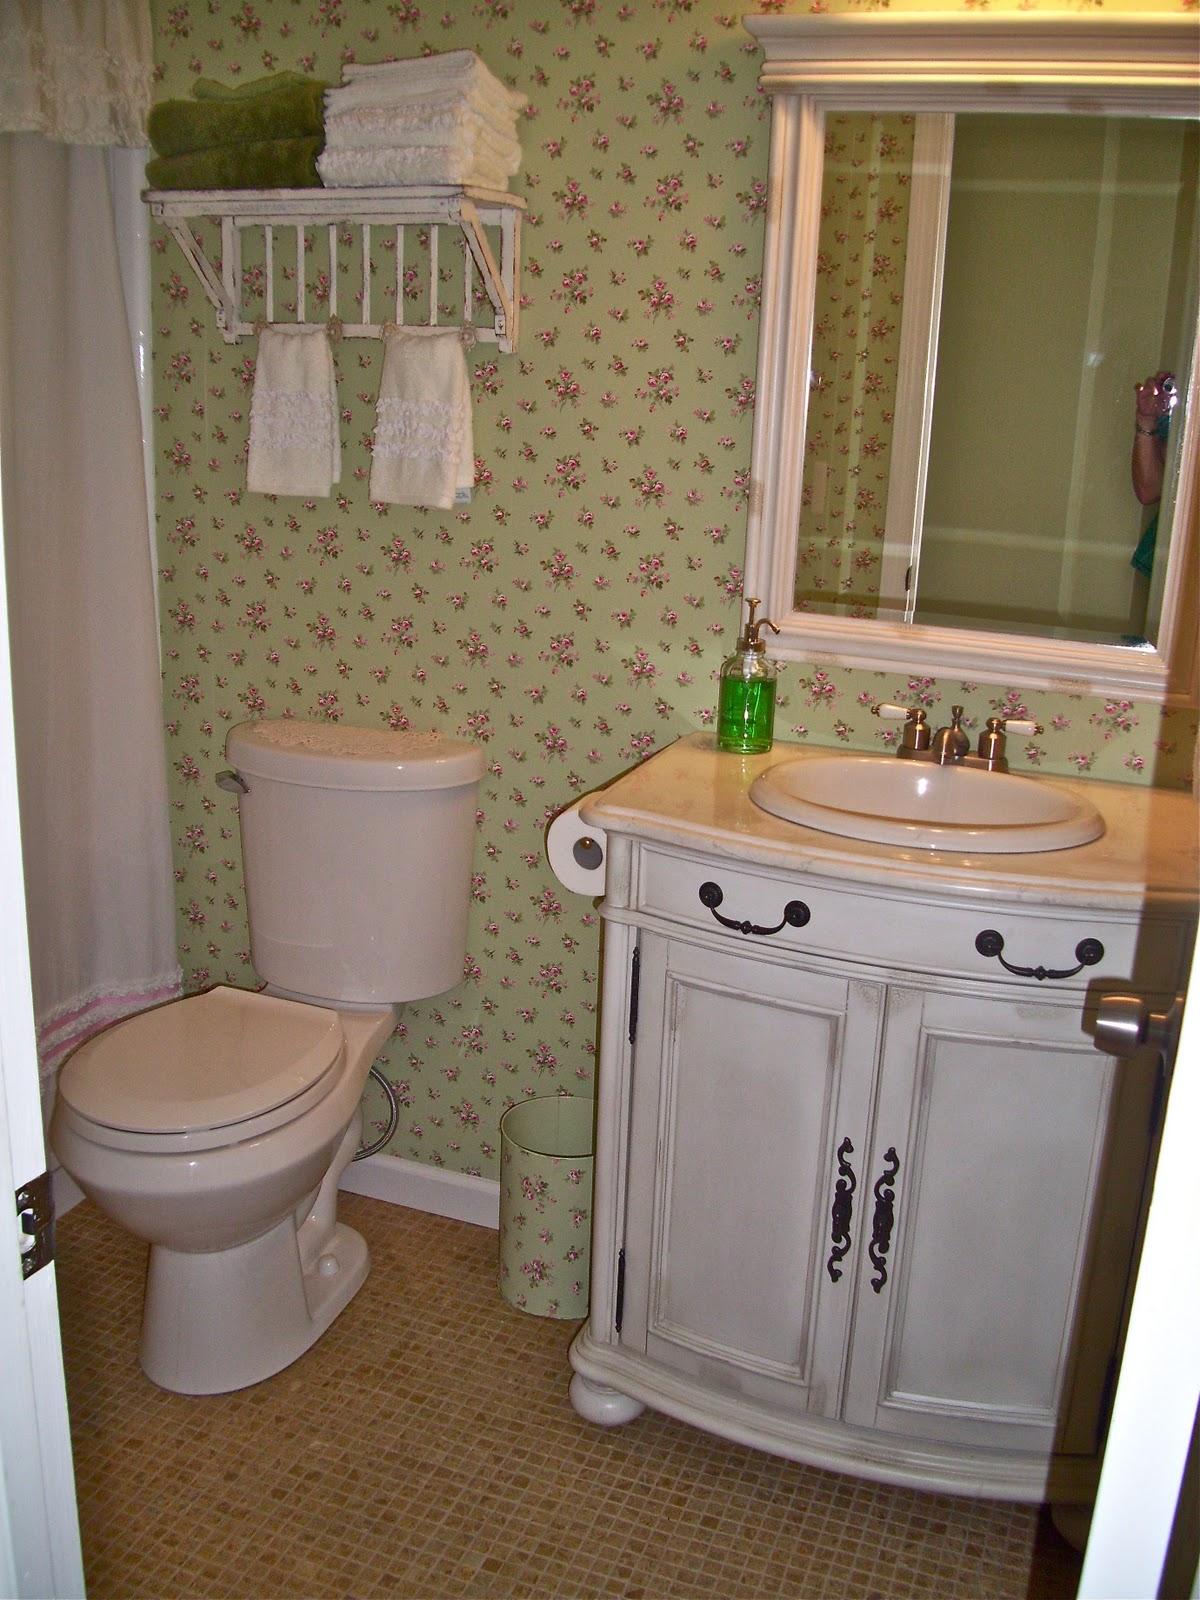 Bathroom cabinets shabby chic - Bathroom Cabinets Shabby Chic 52